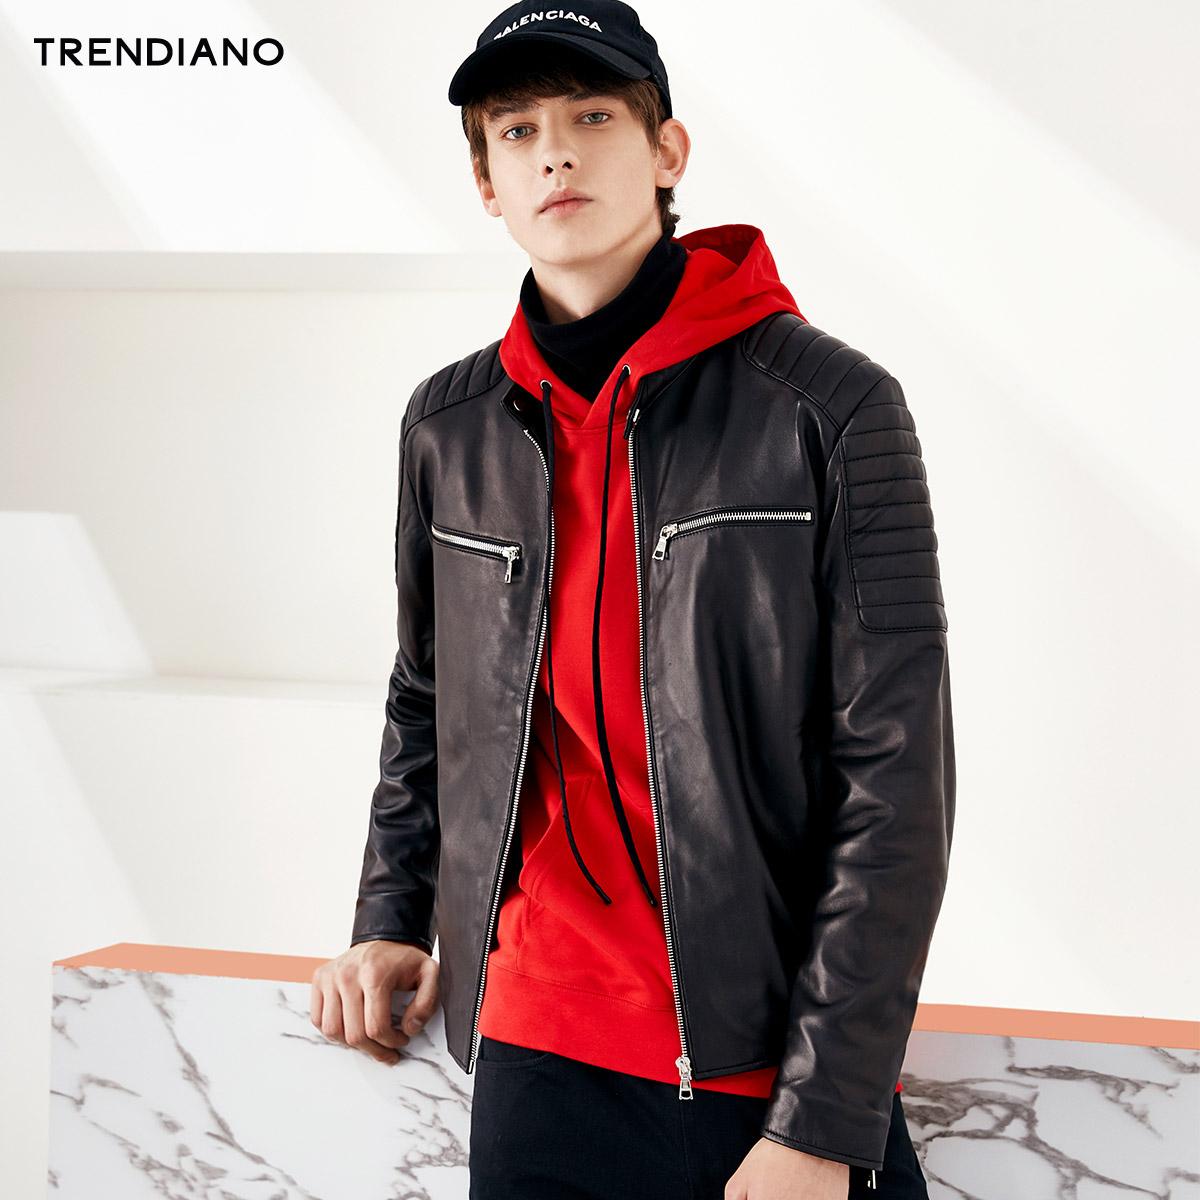 TRENDIANO男装秋装潮流纯色机车绵羊皮长袖皮衣外套3JC331827P